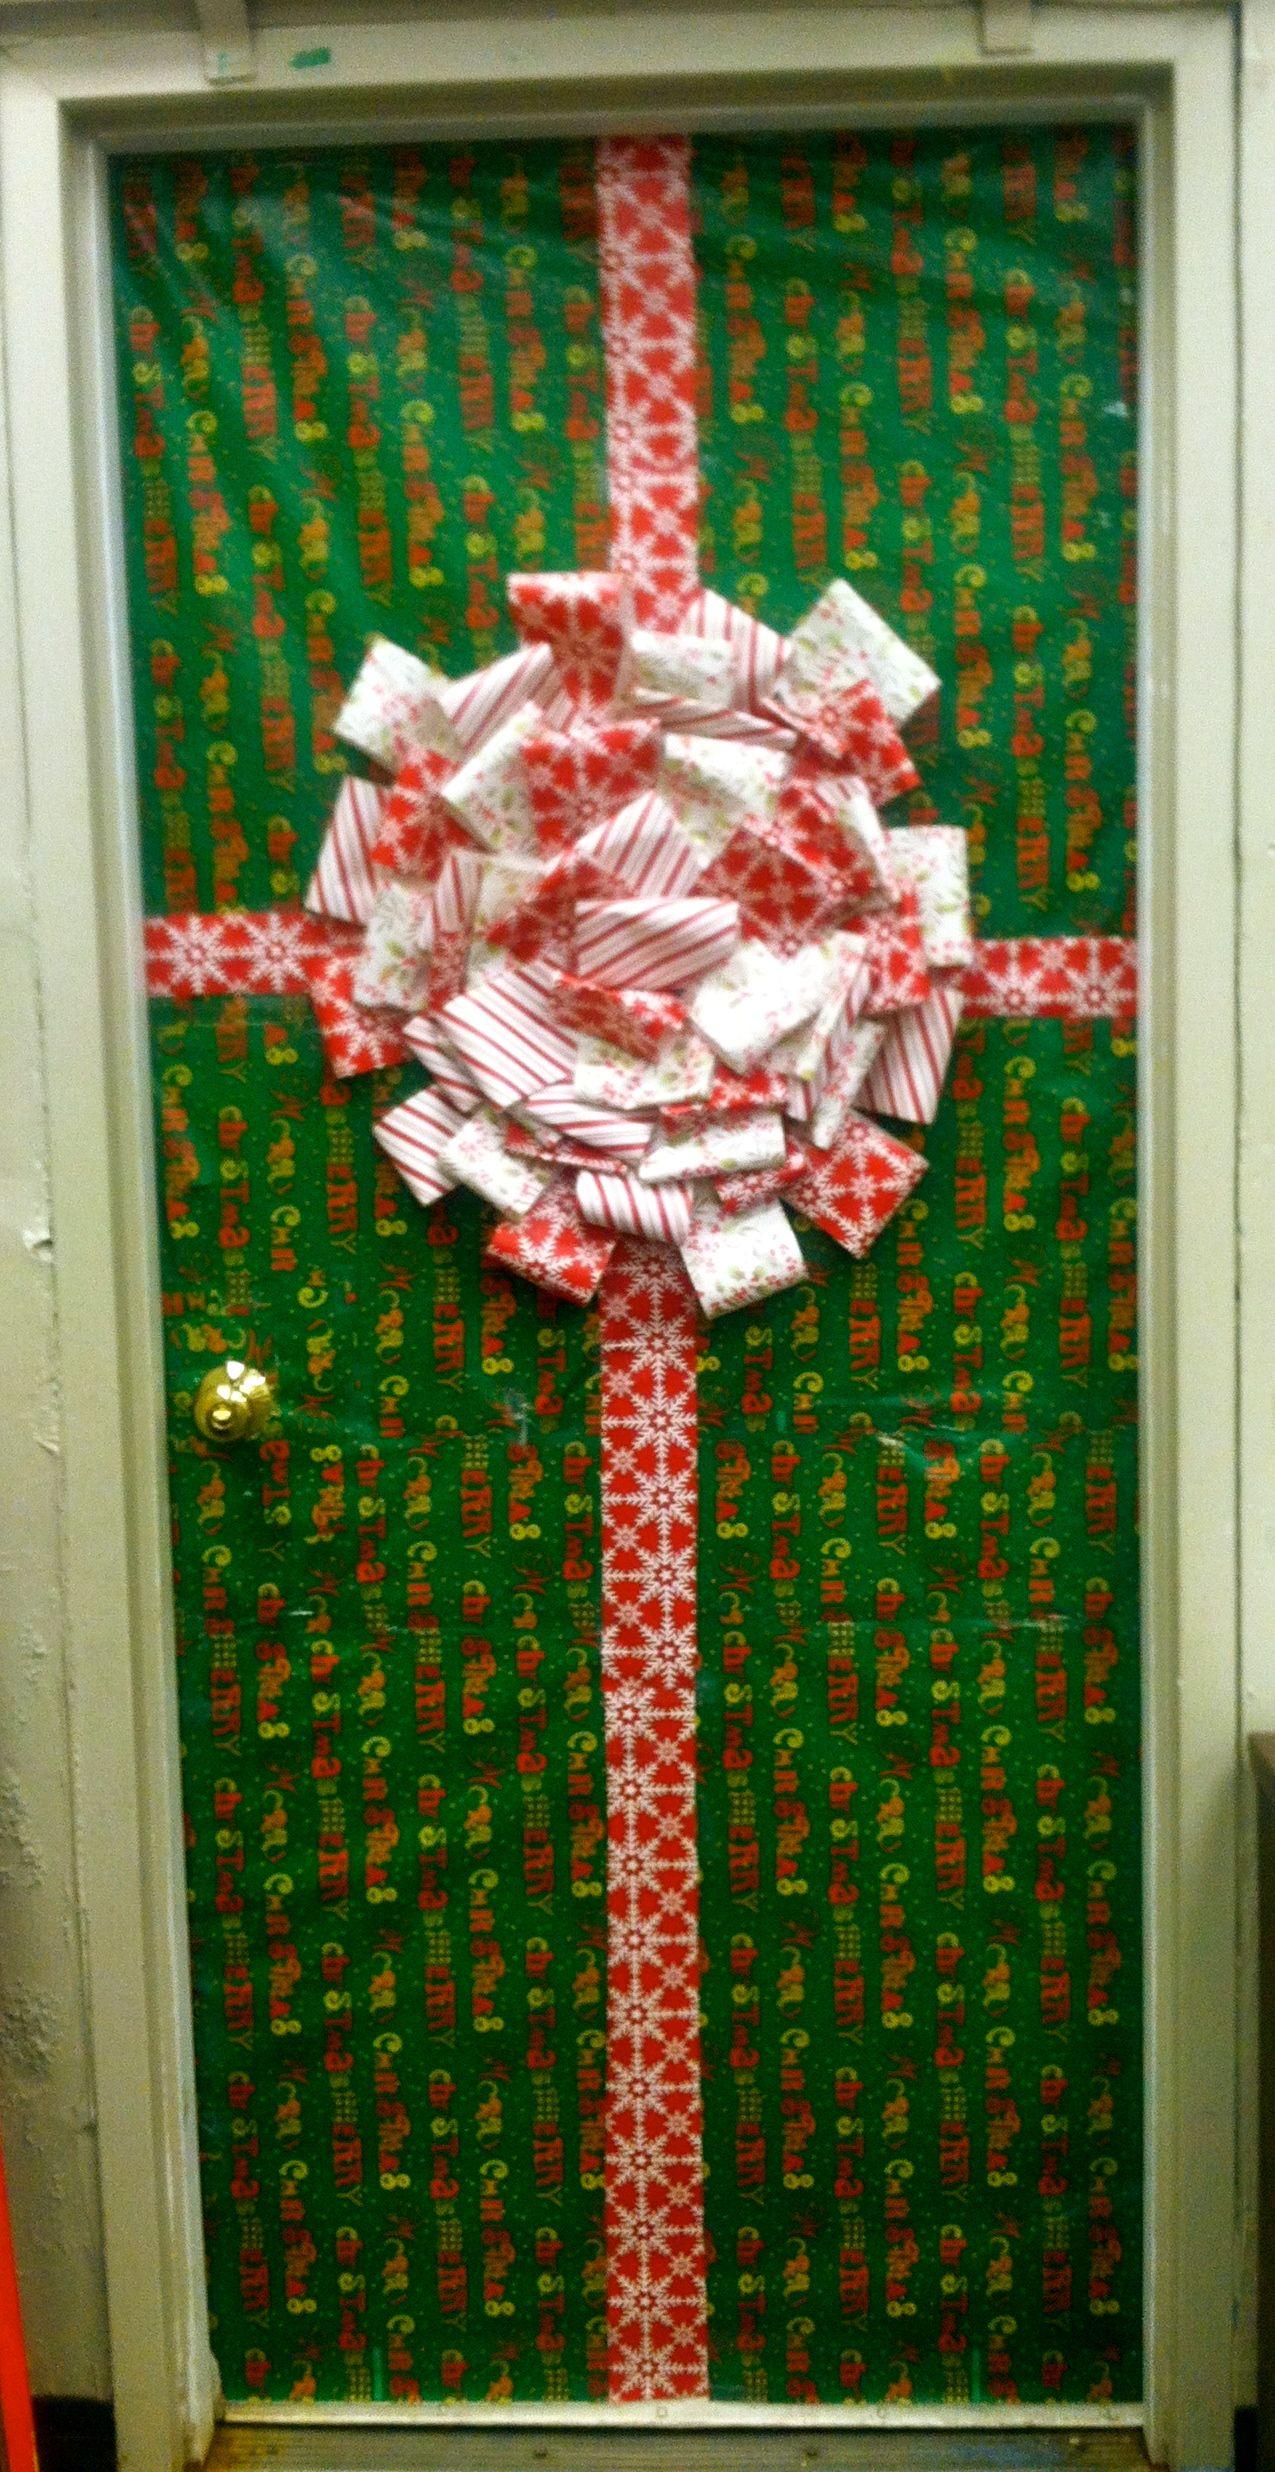 40 Classroom Christmas Decorations Ideas For 2016 School Holiday Door Decorations Christmas